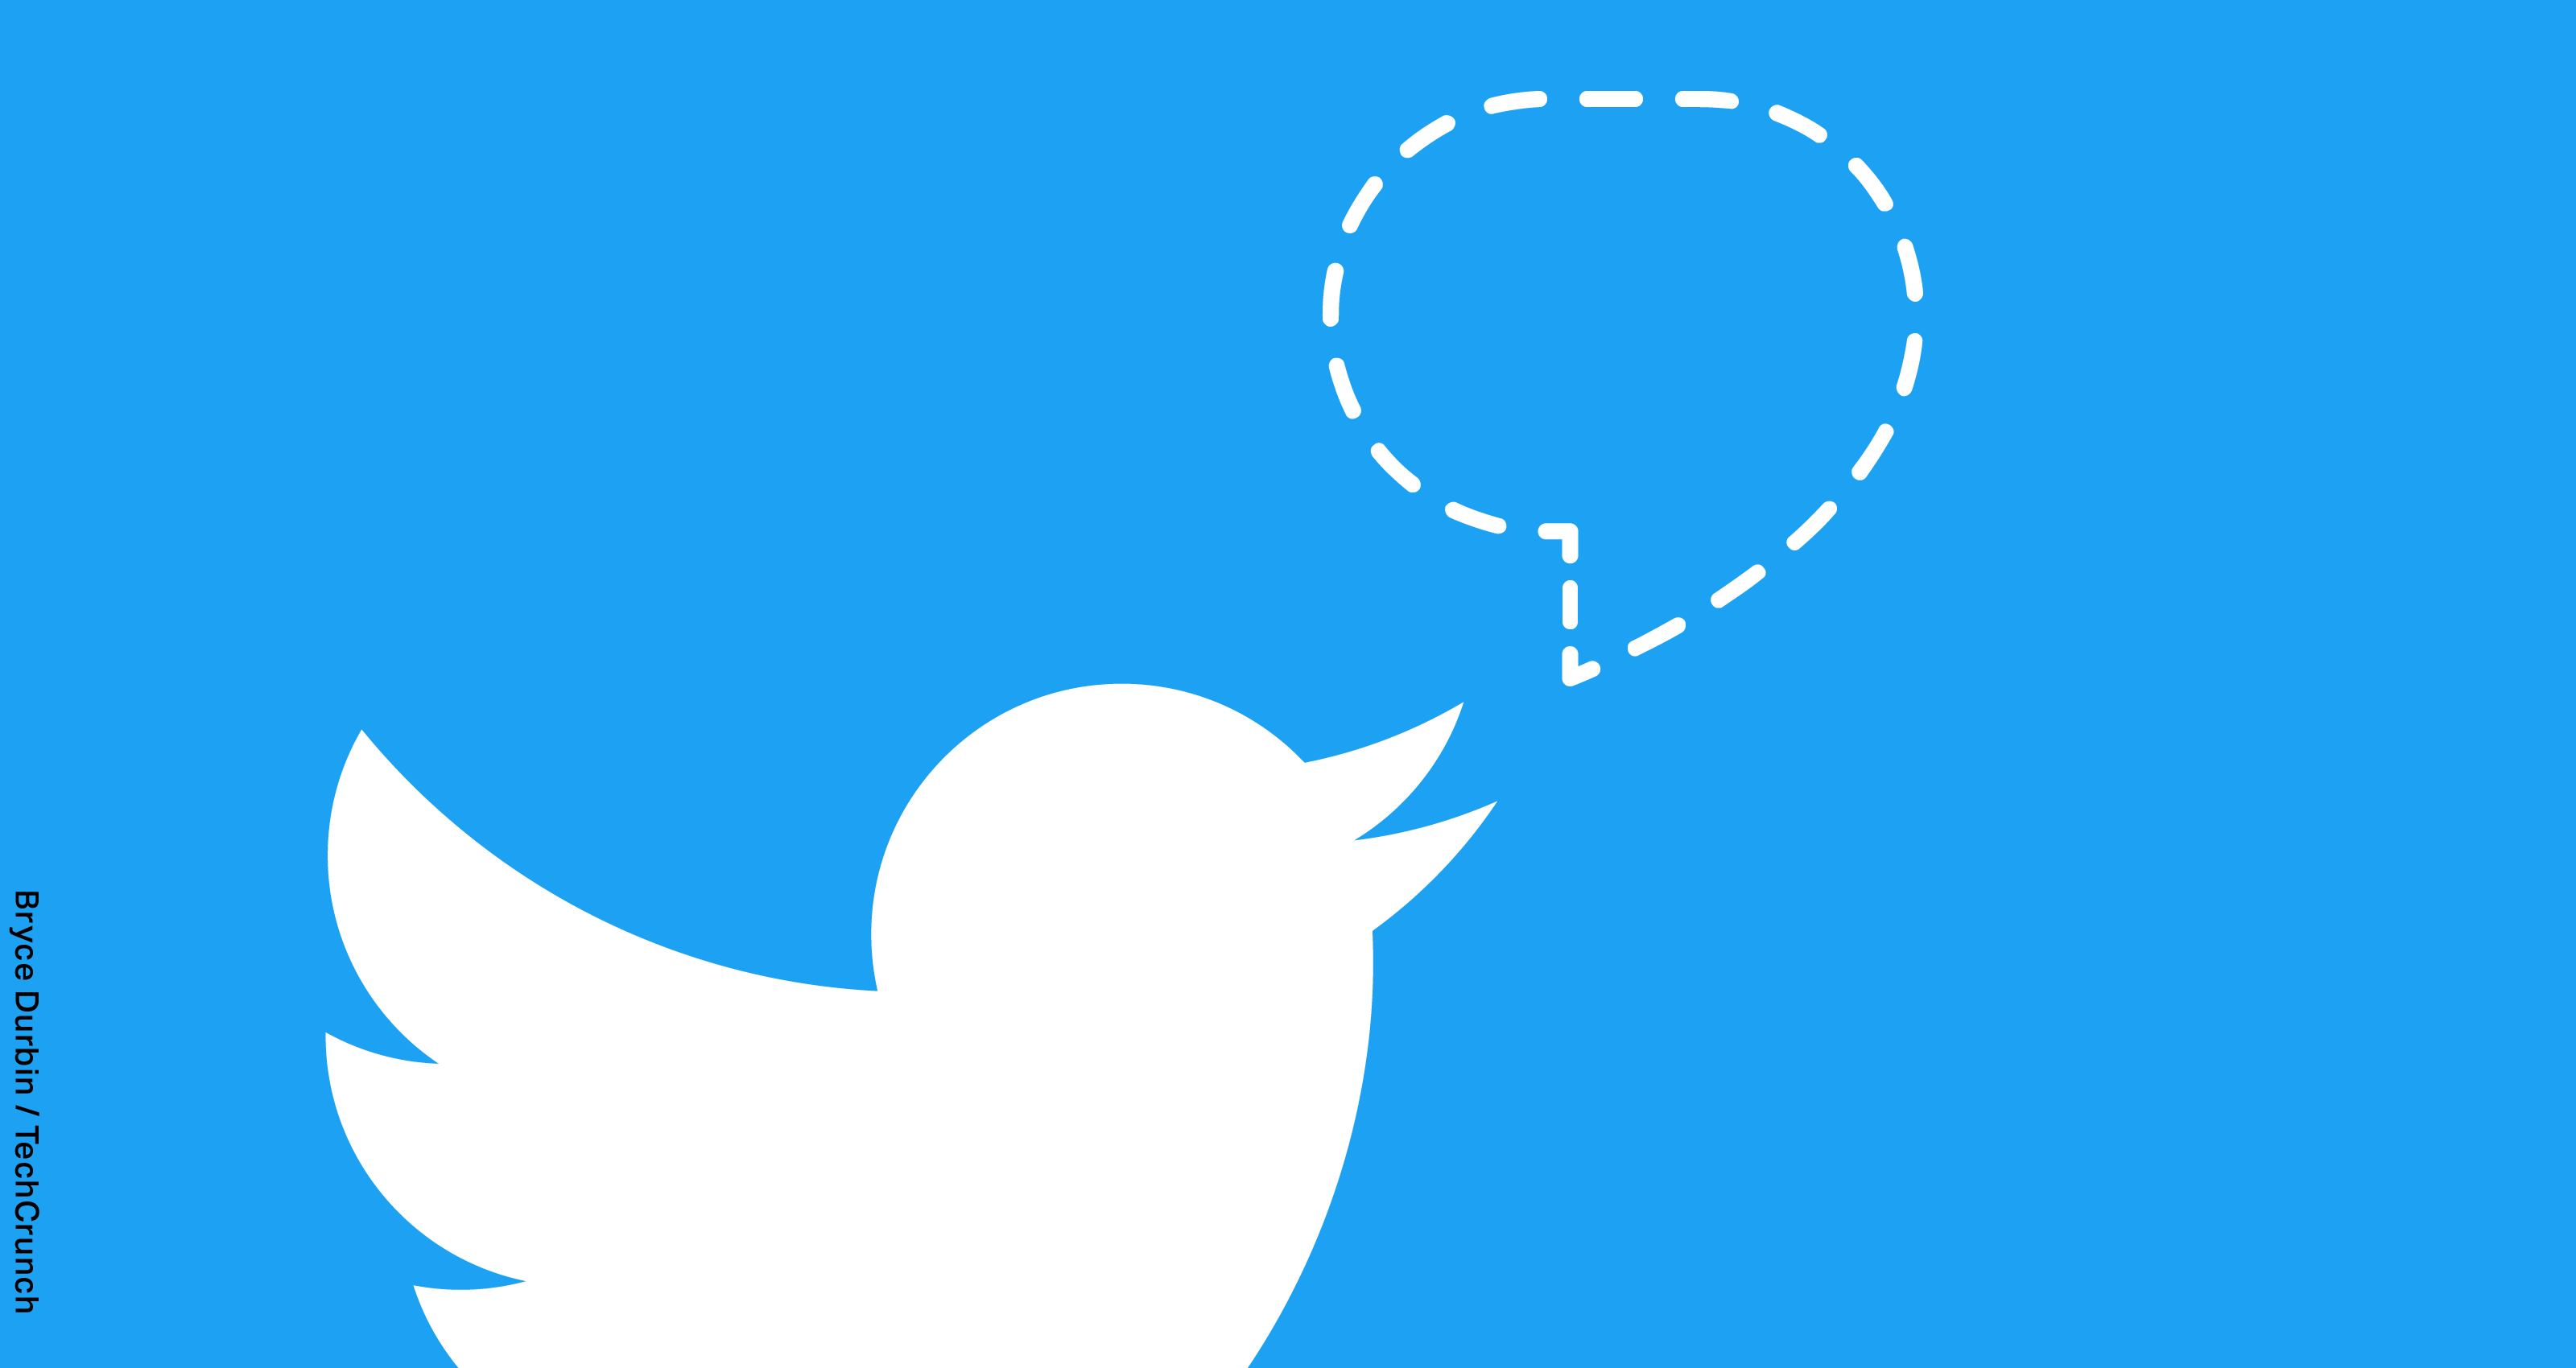 Twitter%E2%80%99%C4%B1n+DM%E2%80%99i+de+seslendi%21;